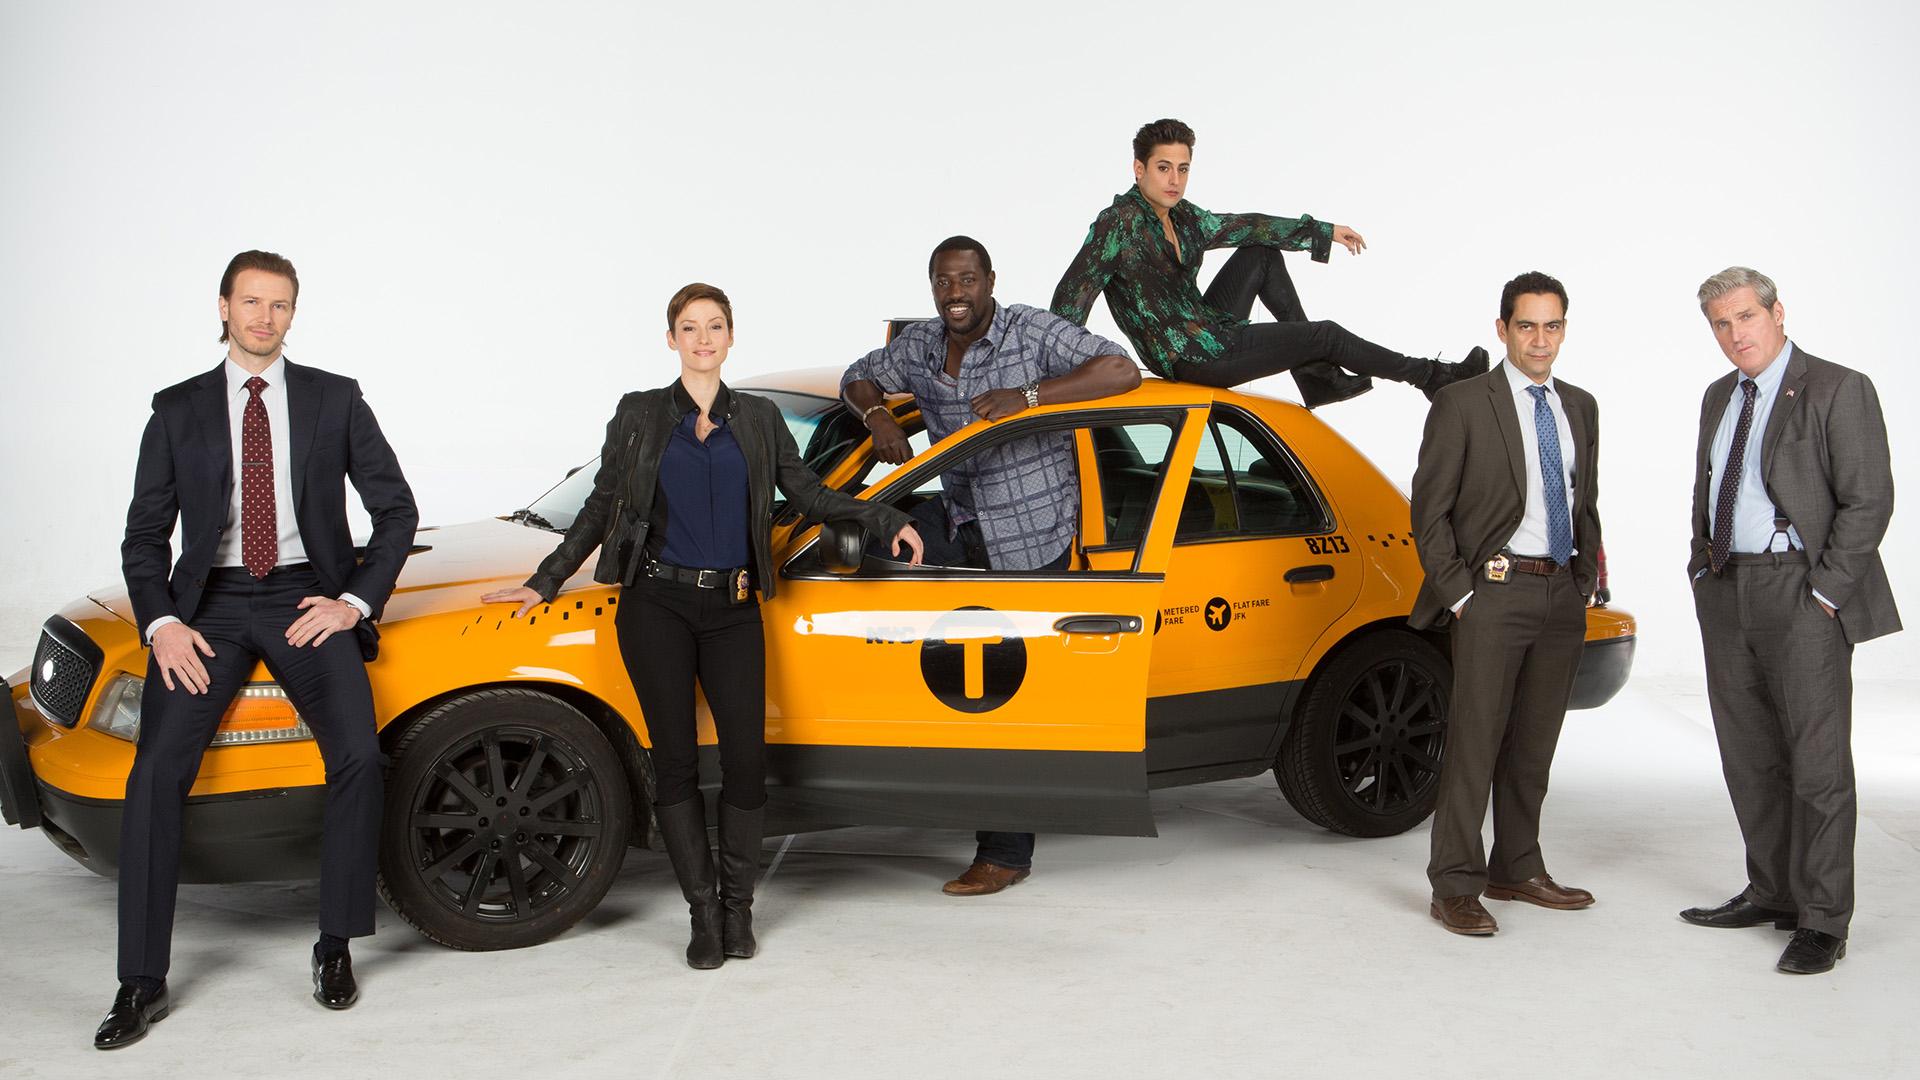 Taxi Brooklyn TV Show